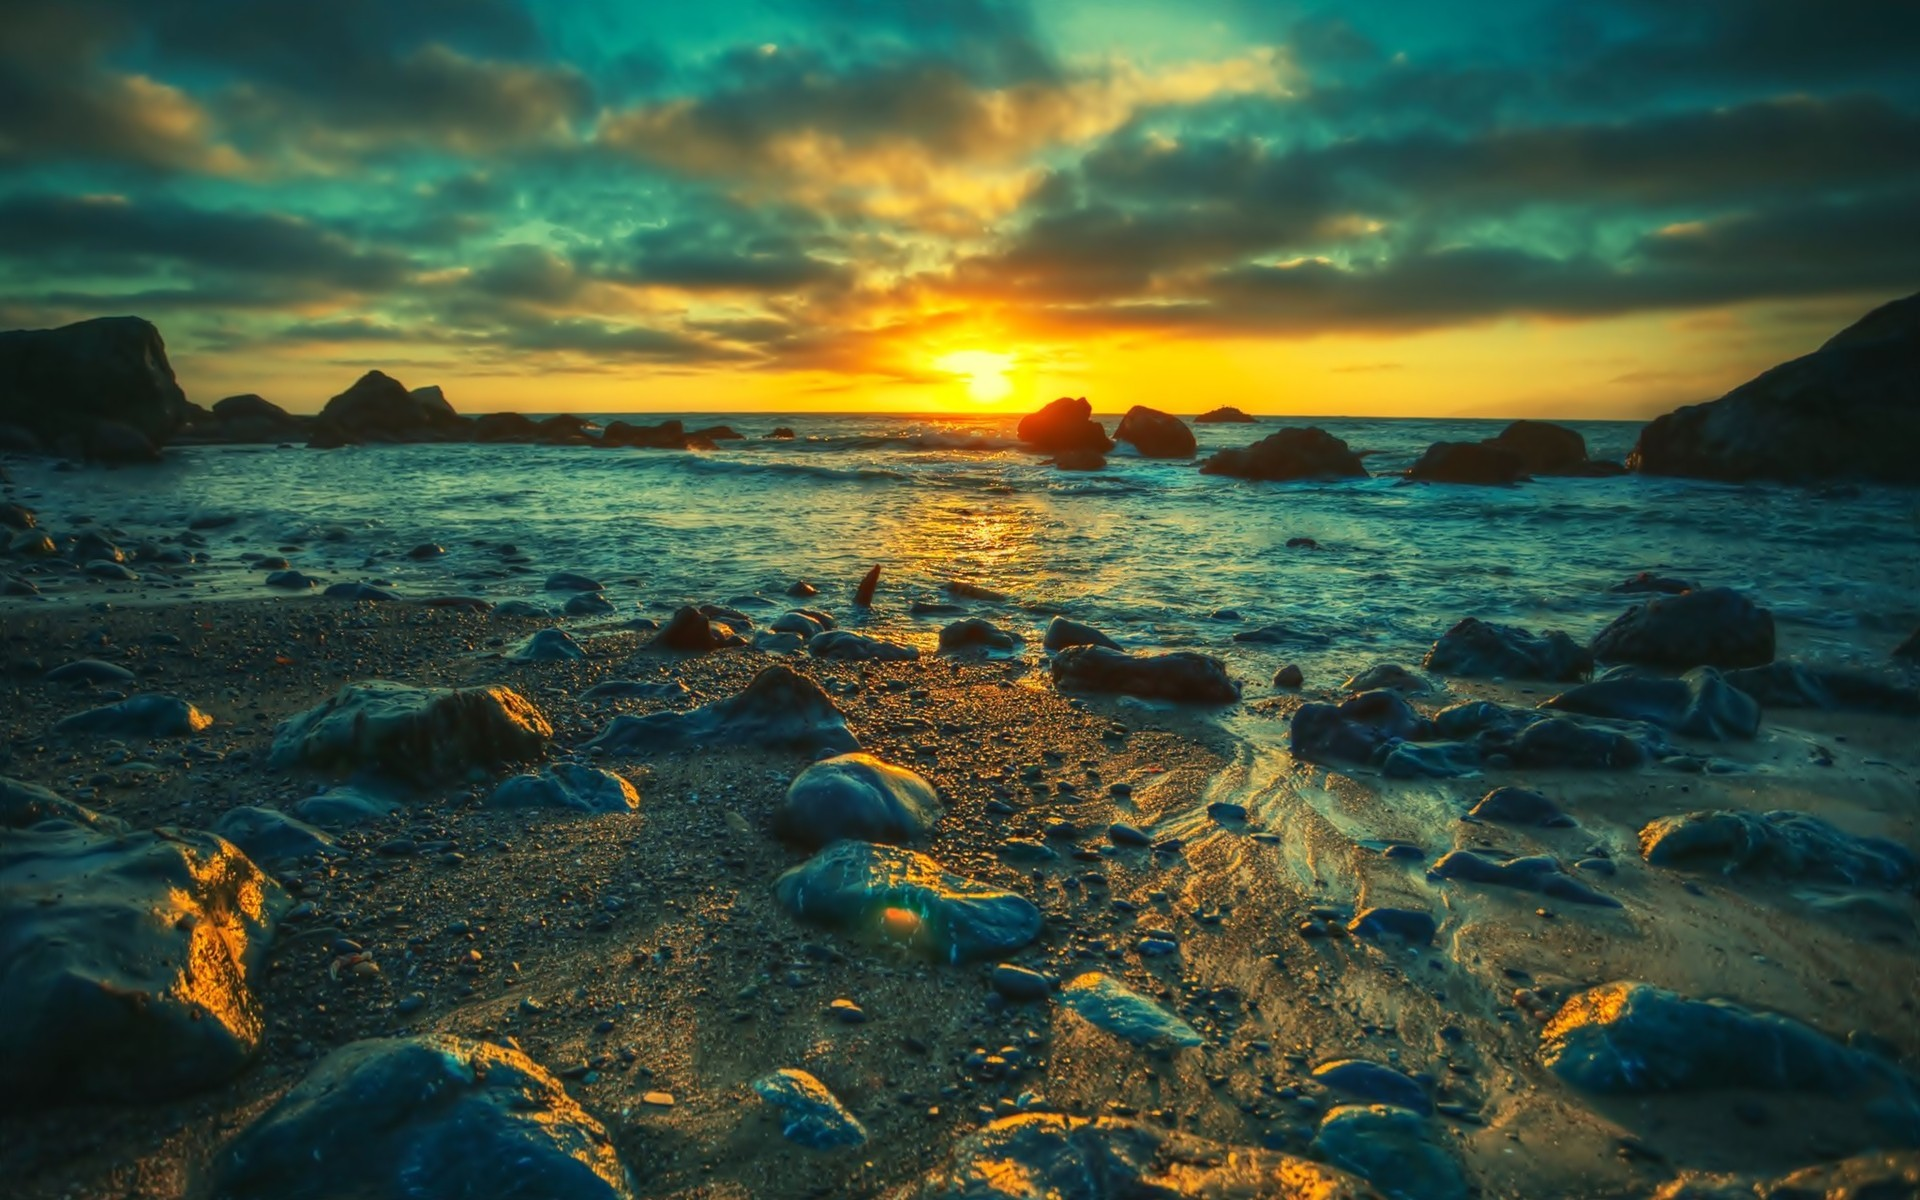 Landscape Desktop Backgrounds Posted By Christopher Thompson